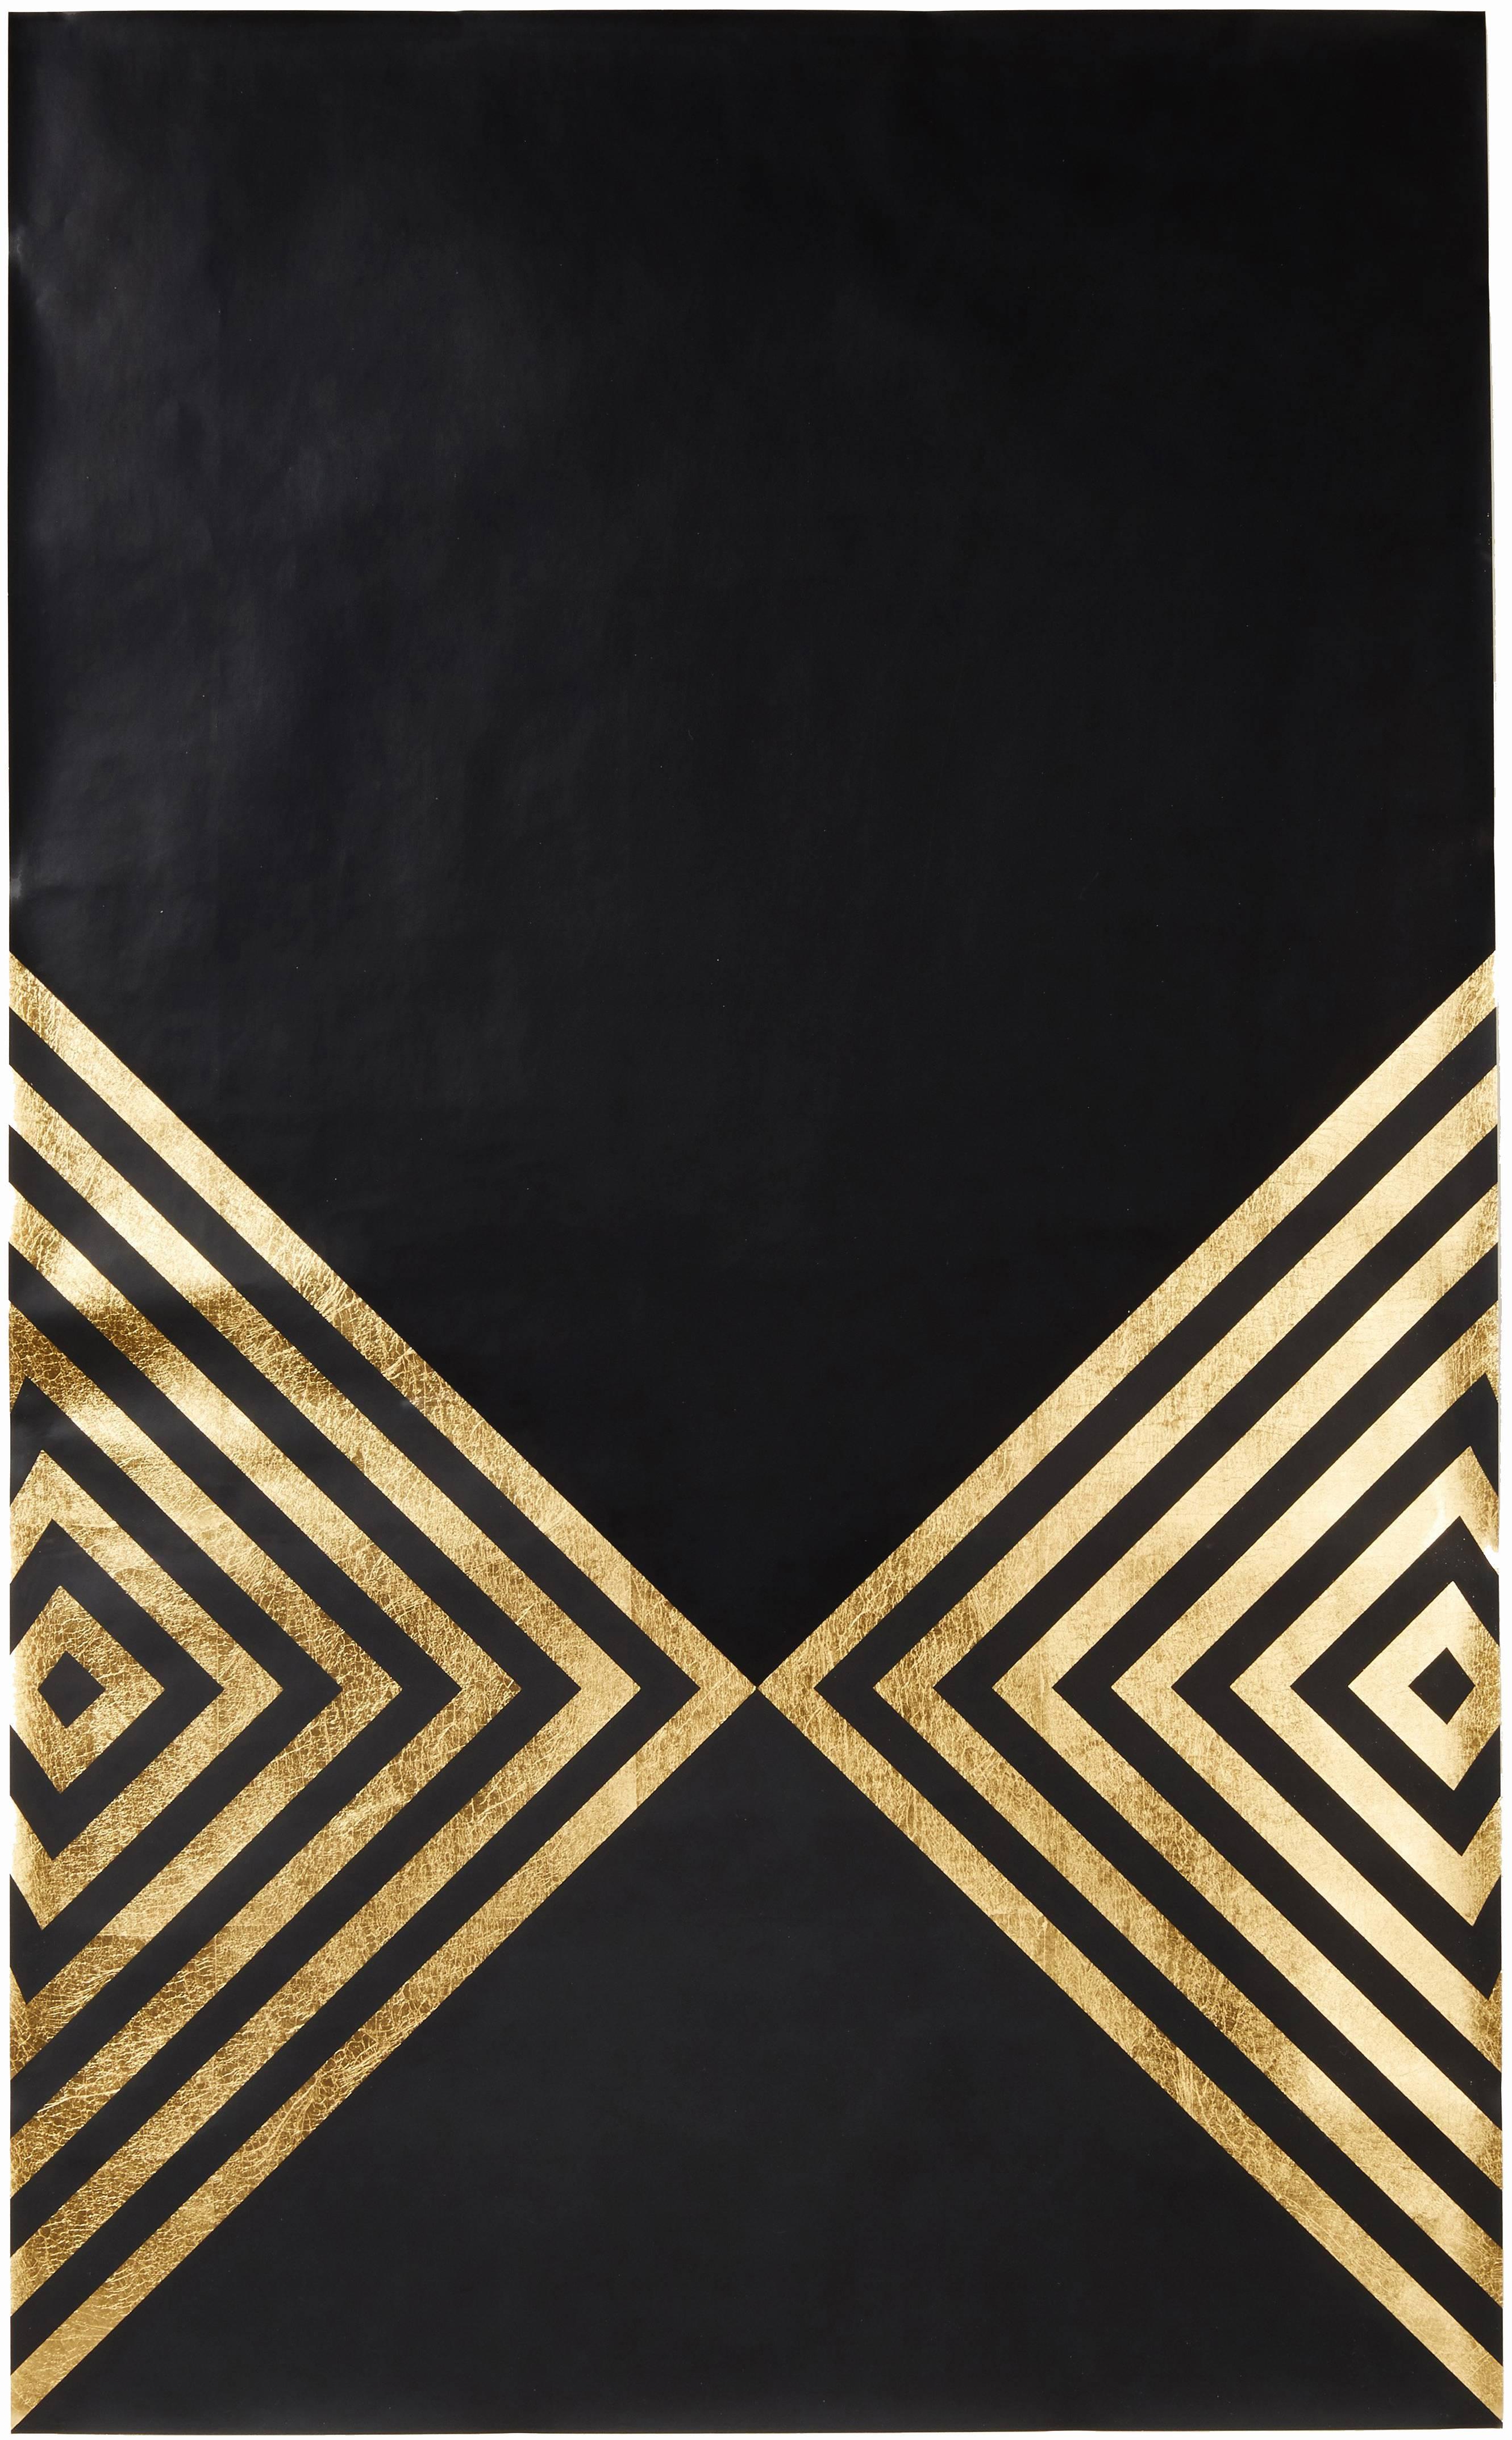 Hunt Arrows (design gold black metallic work on paper gold stripes Art Deco)